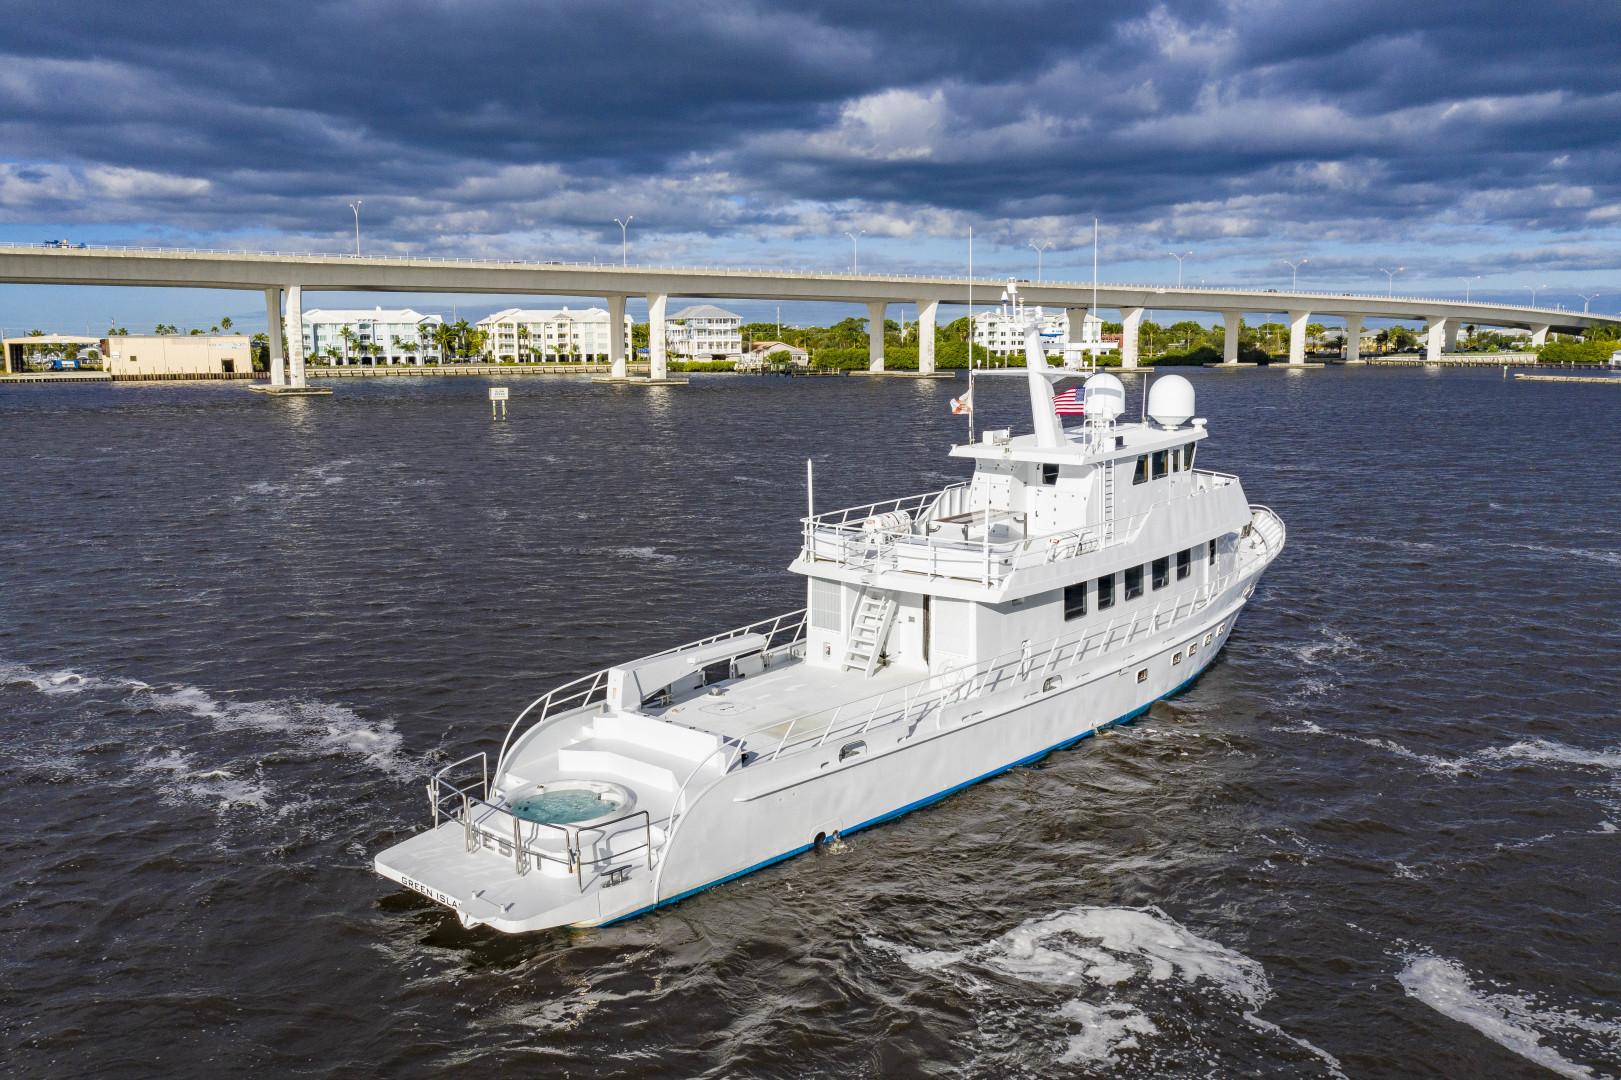 GlassTech-Expedition Yacht 2018-Reset Stuart-Florida-United States-Profile-1568540 | Thumbnail